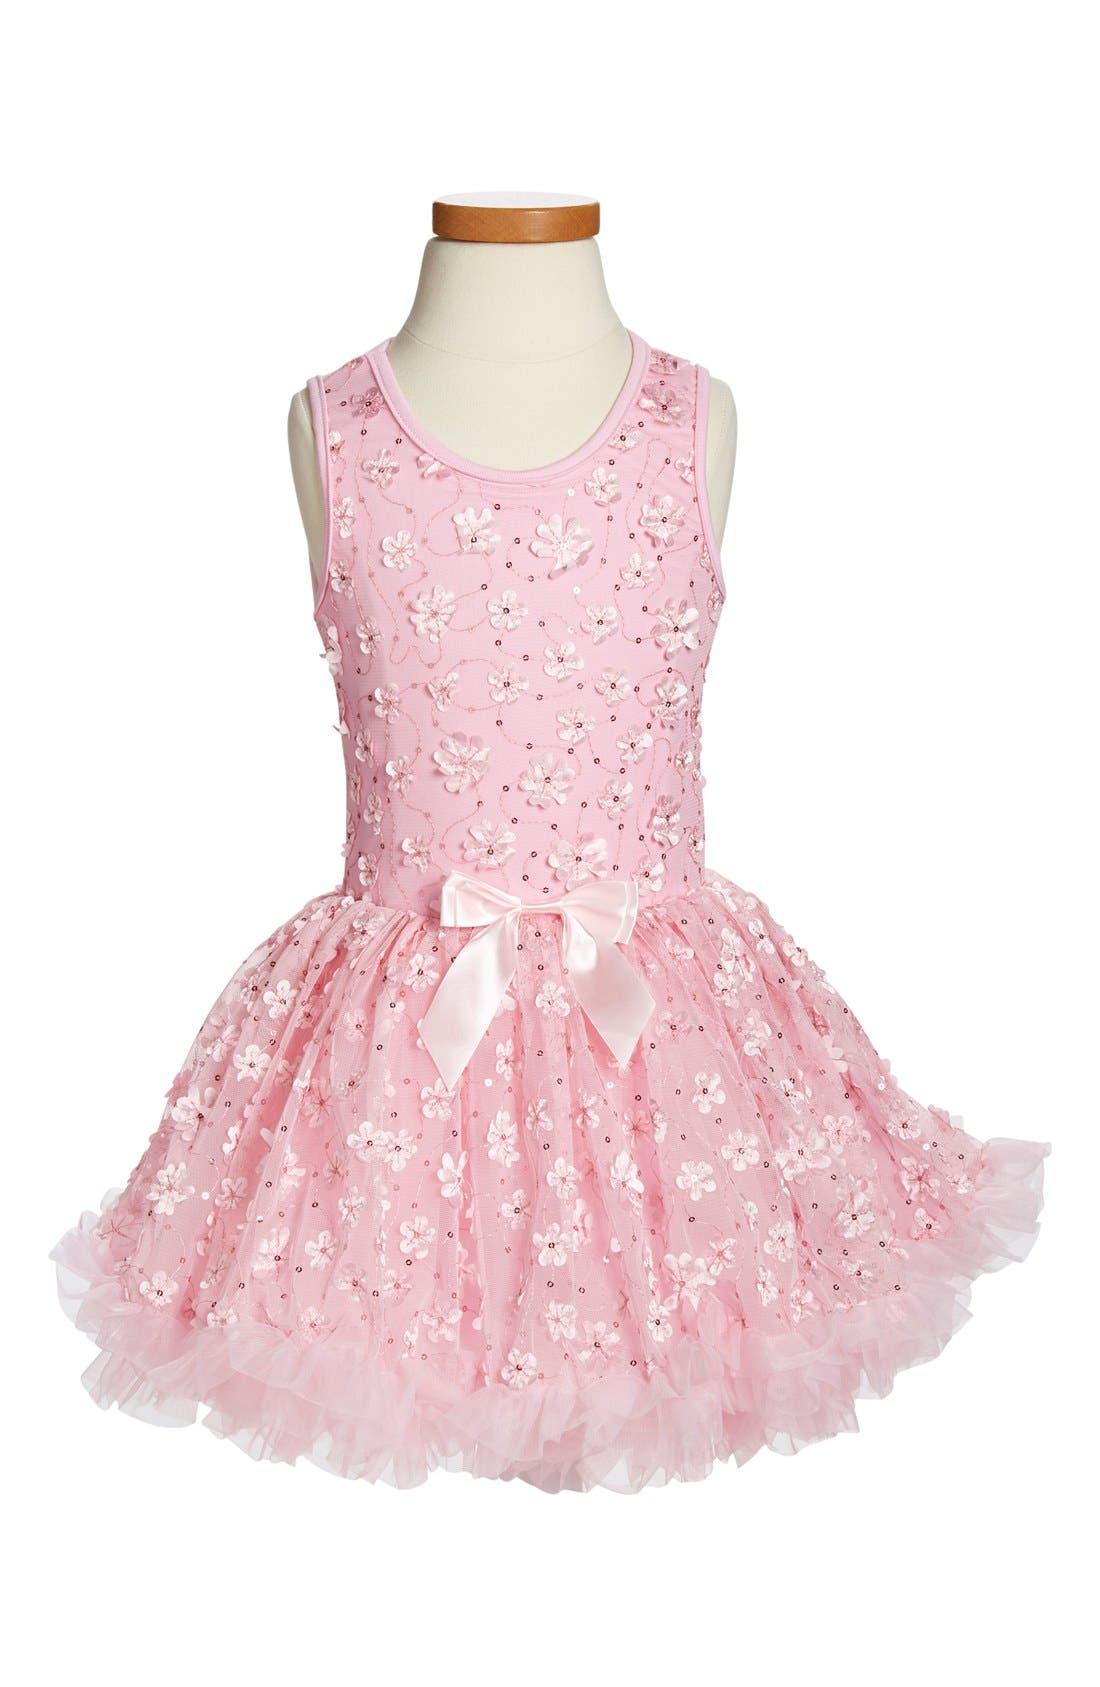 POPATU Ribbon Rosette Flower Dress